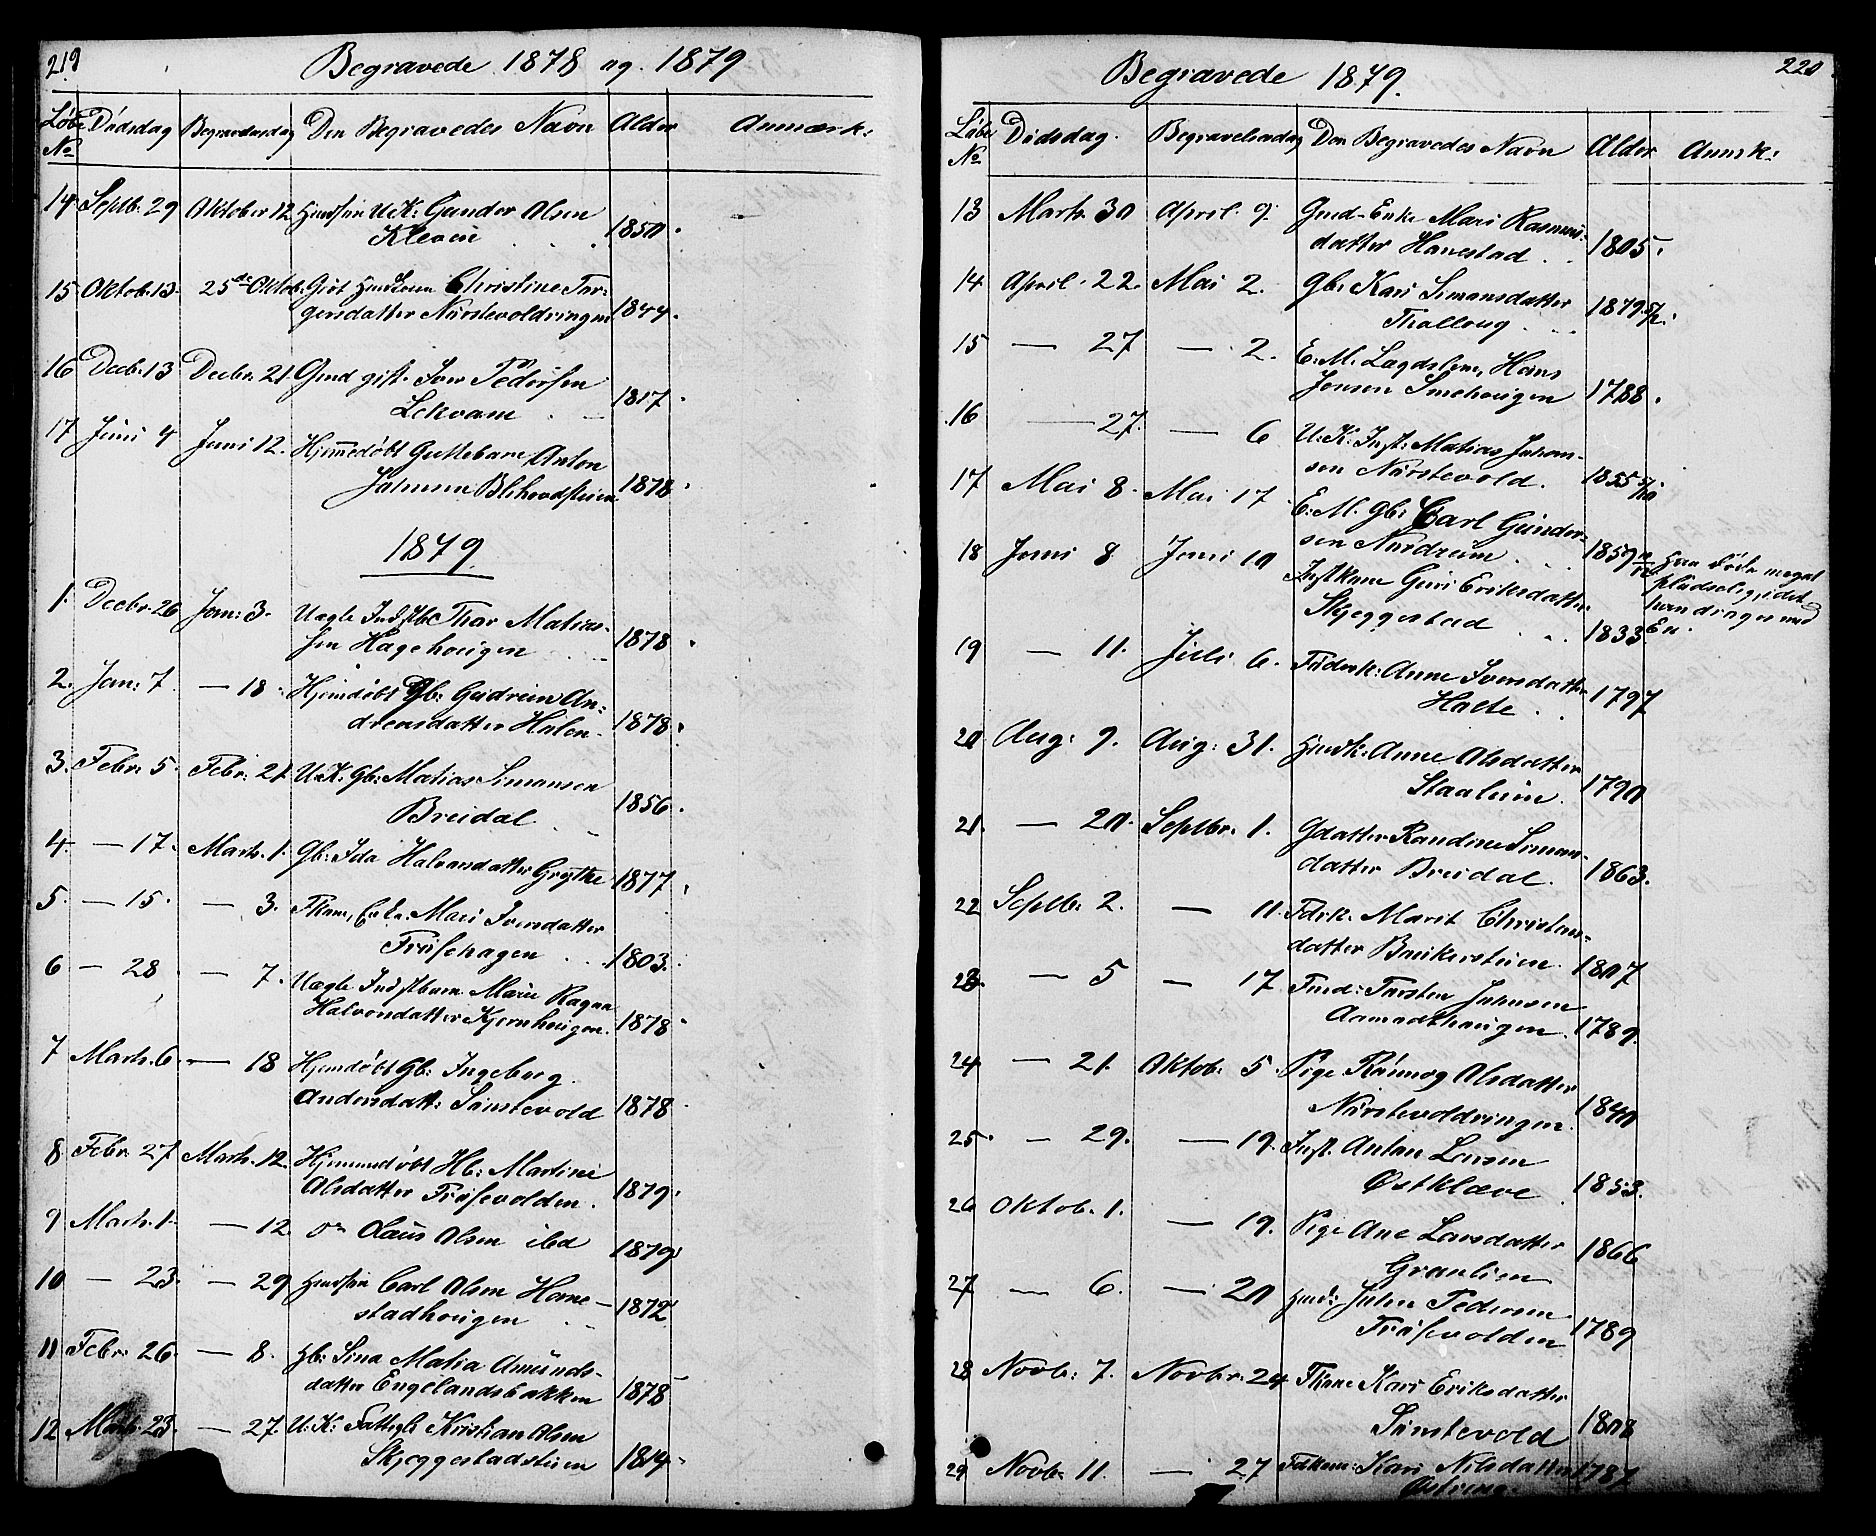 SAH, Østre Gausdal prestekontor, Klokkerbok nr. 1, 1863-1893, s. 219-220